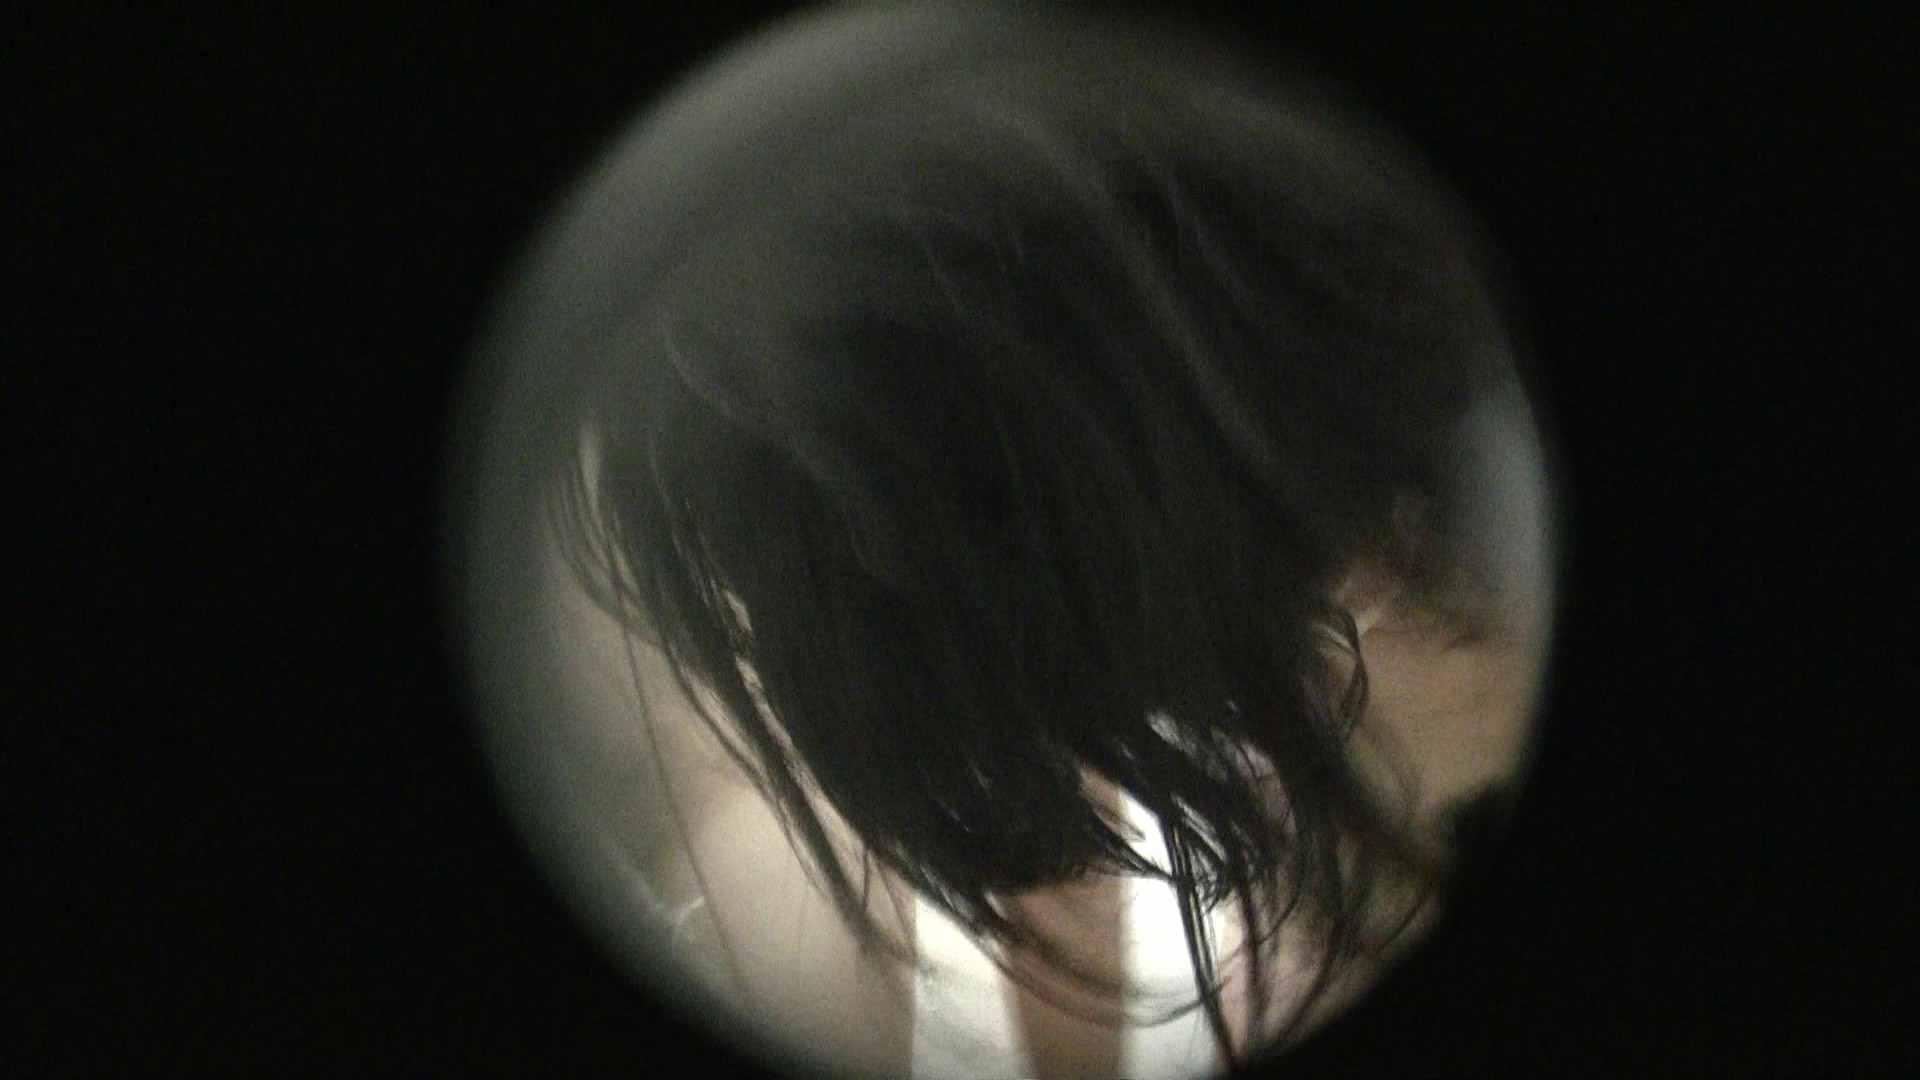 NO.23 色白巨乳嬢×2 シャワー ぱこり動画紹介 98枚 26